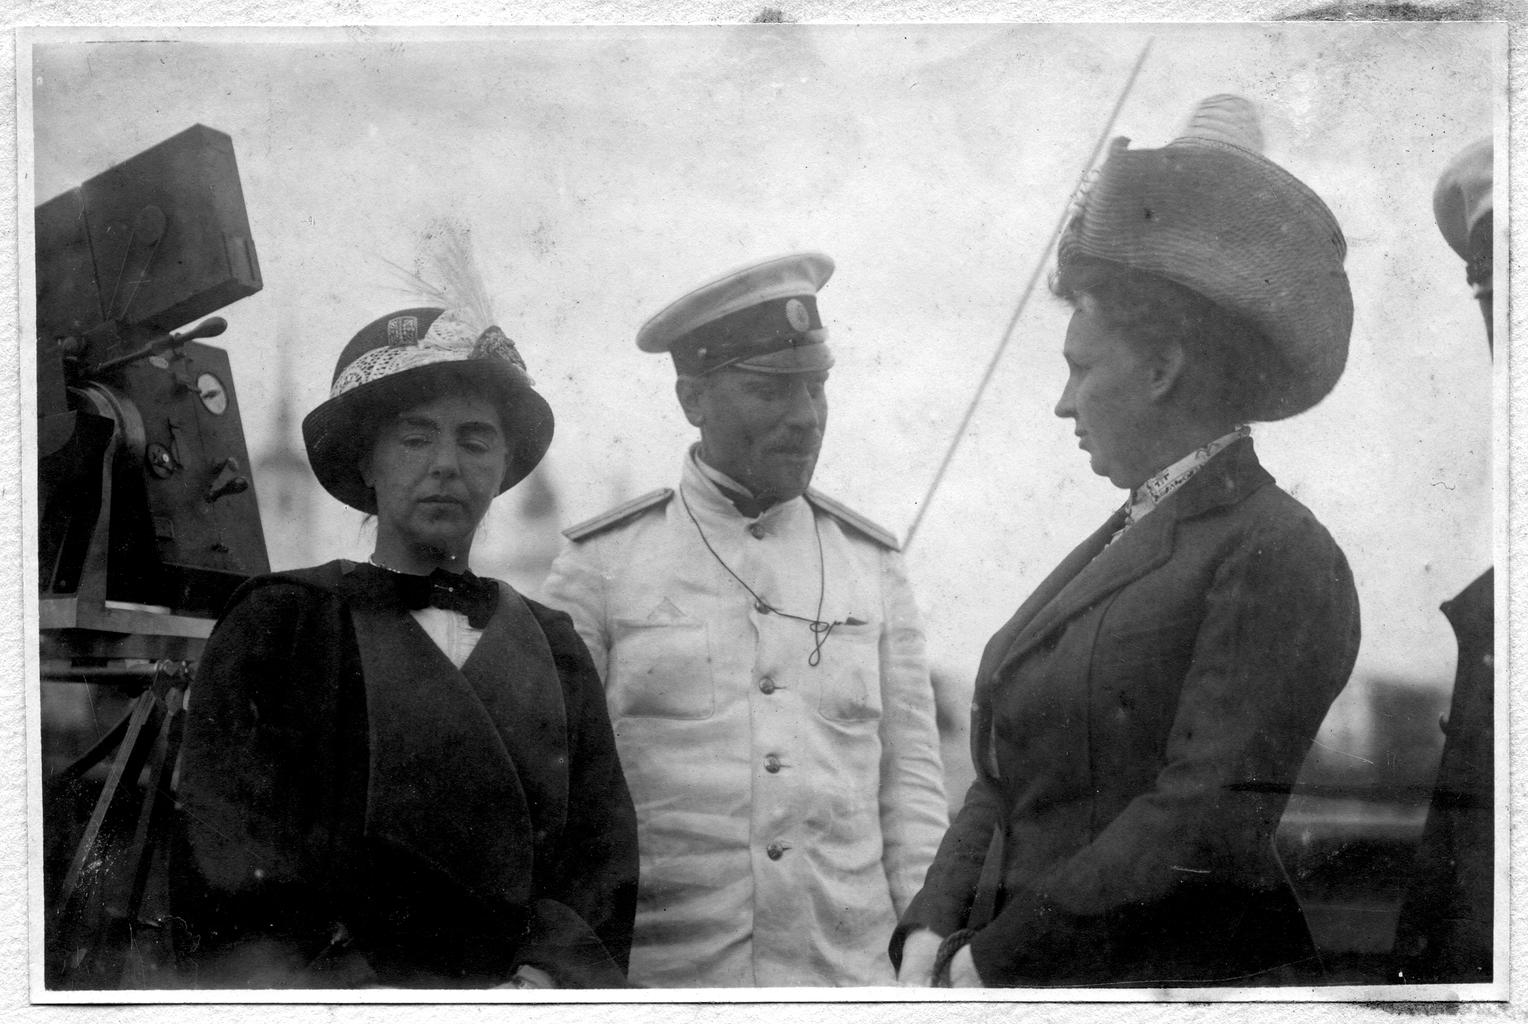 Седов Г. Я. с провожающими на палубе судна